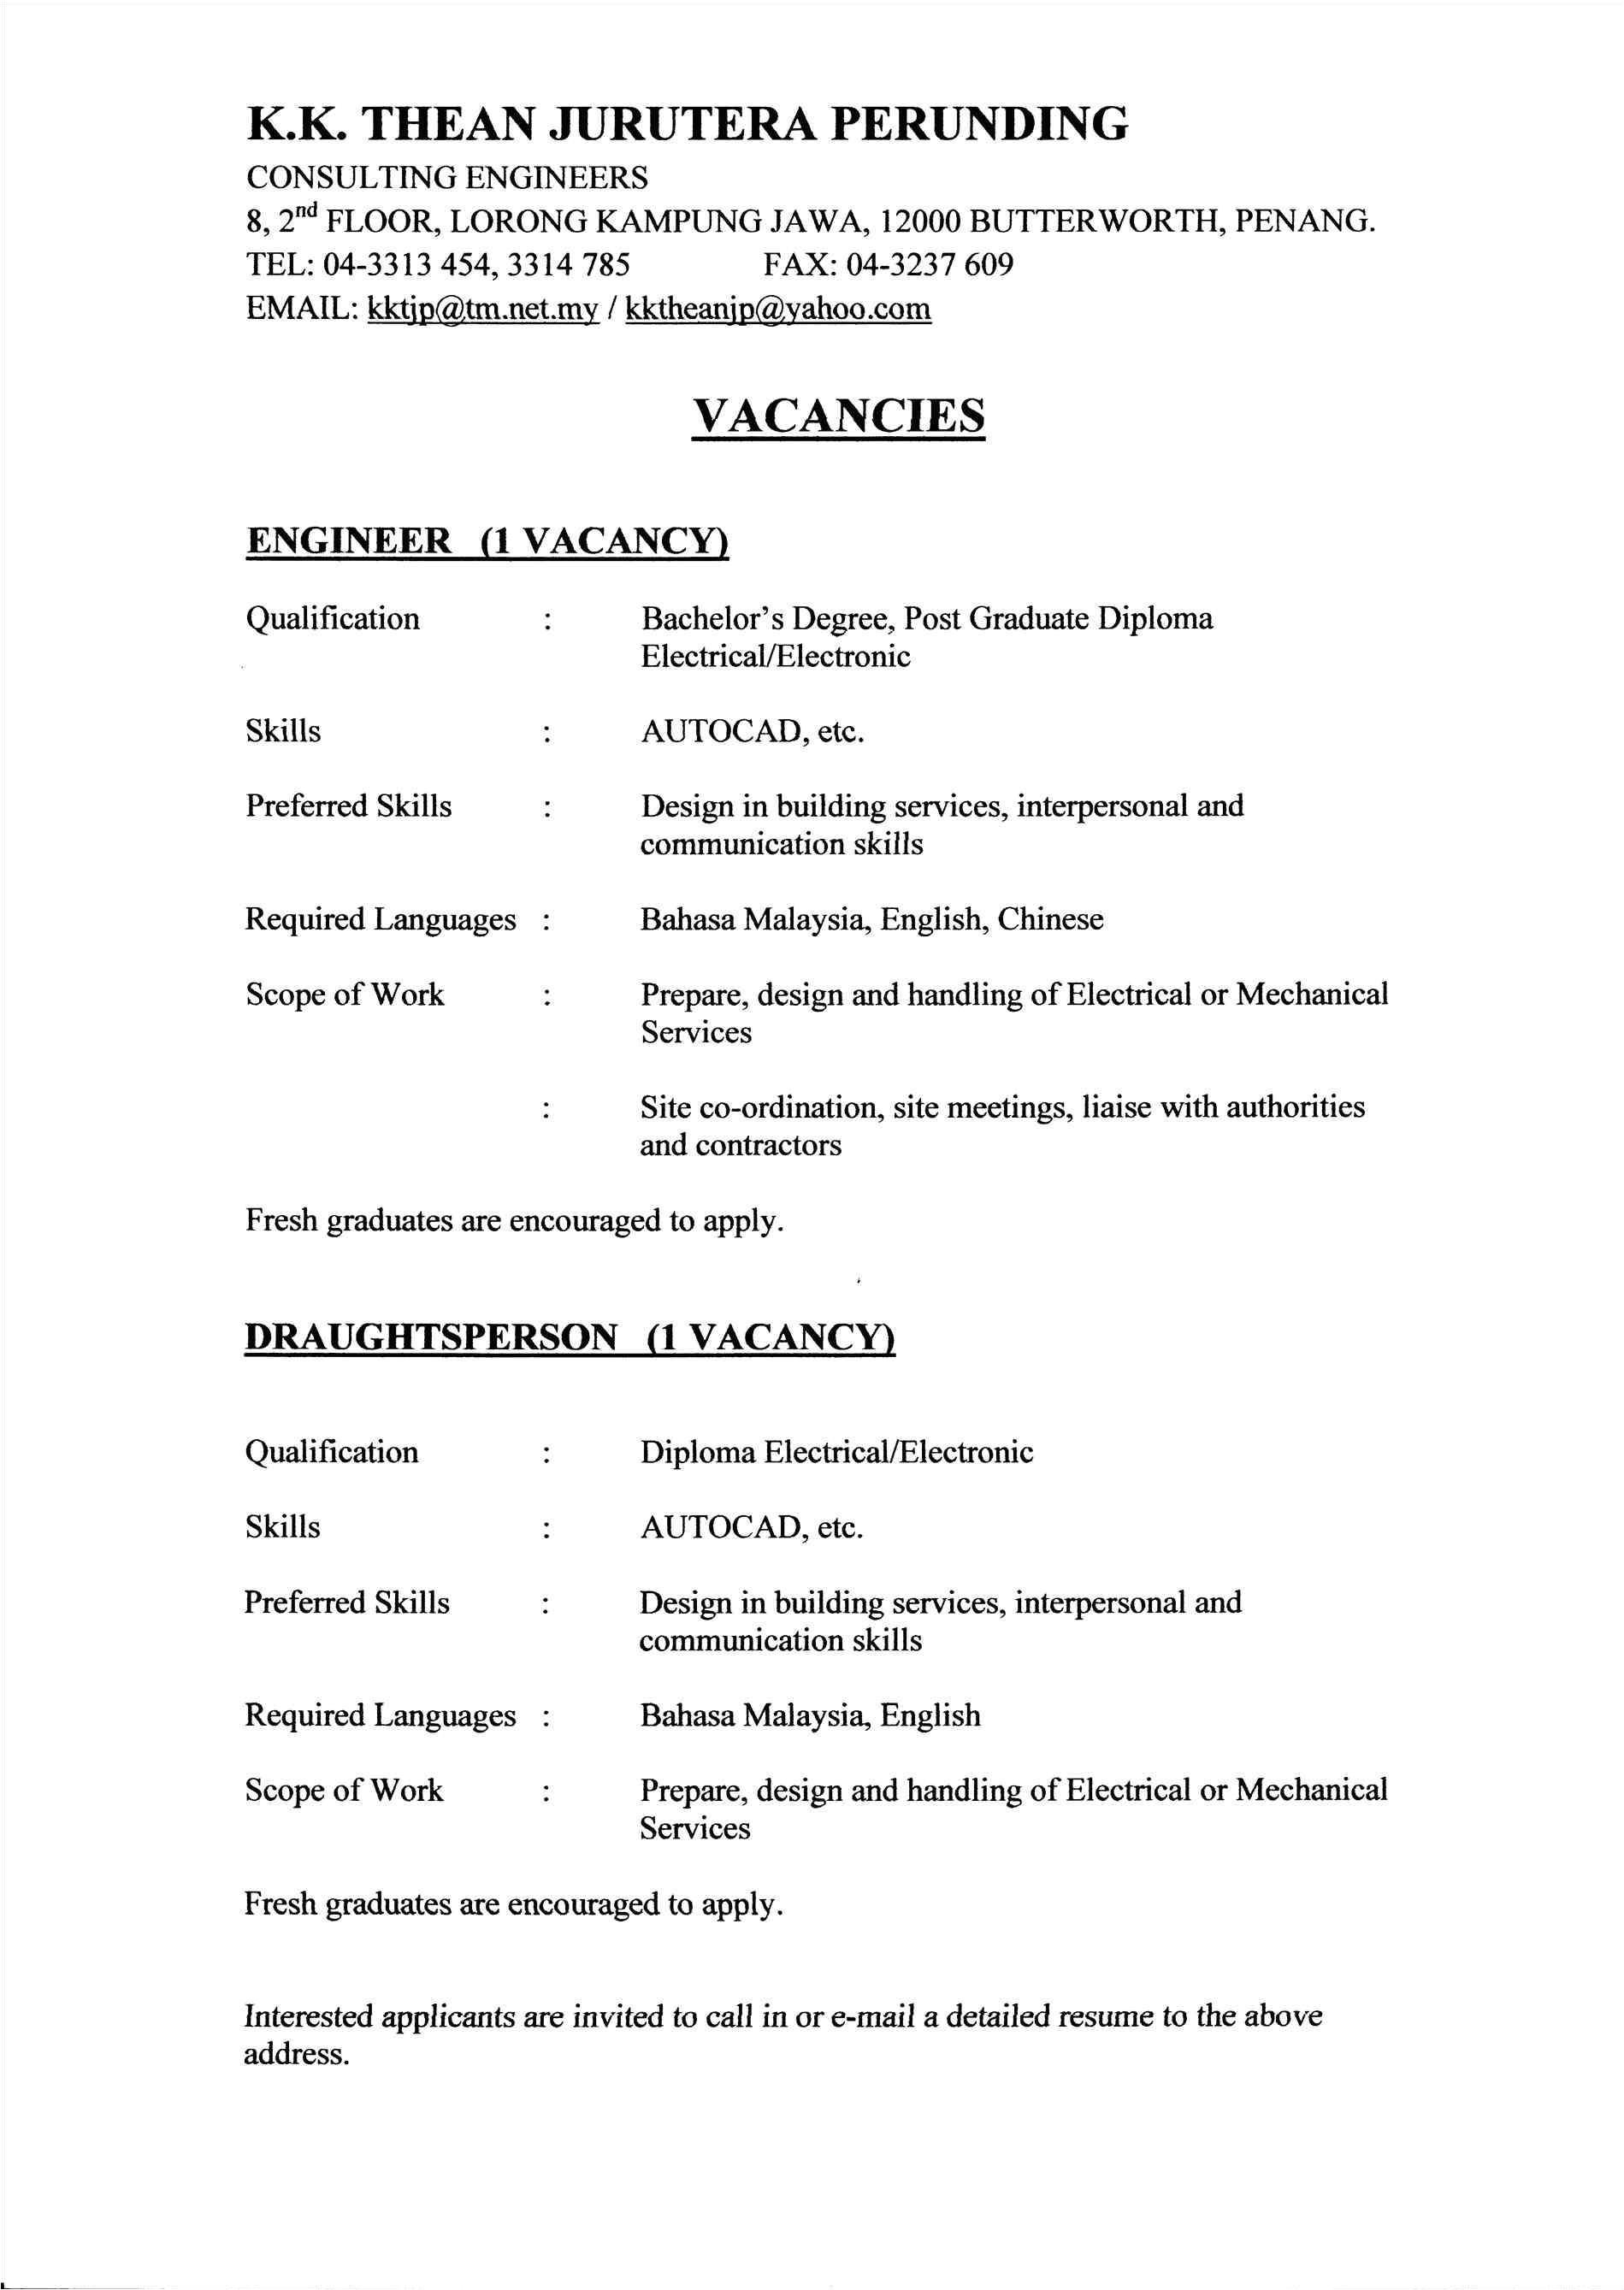 resume for civil engineering fresh graduate